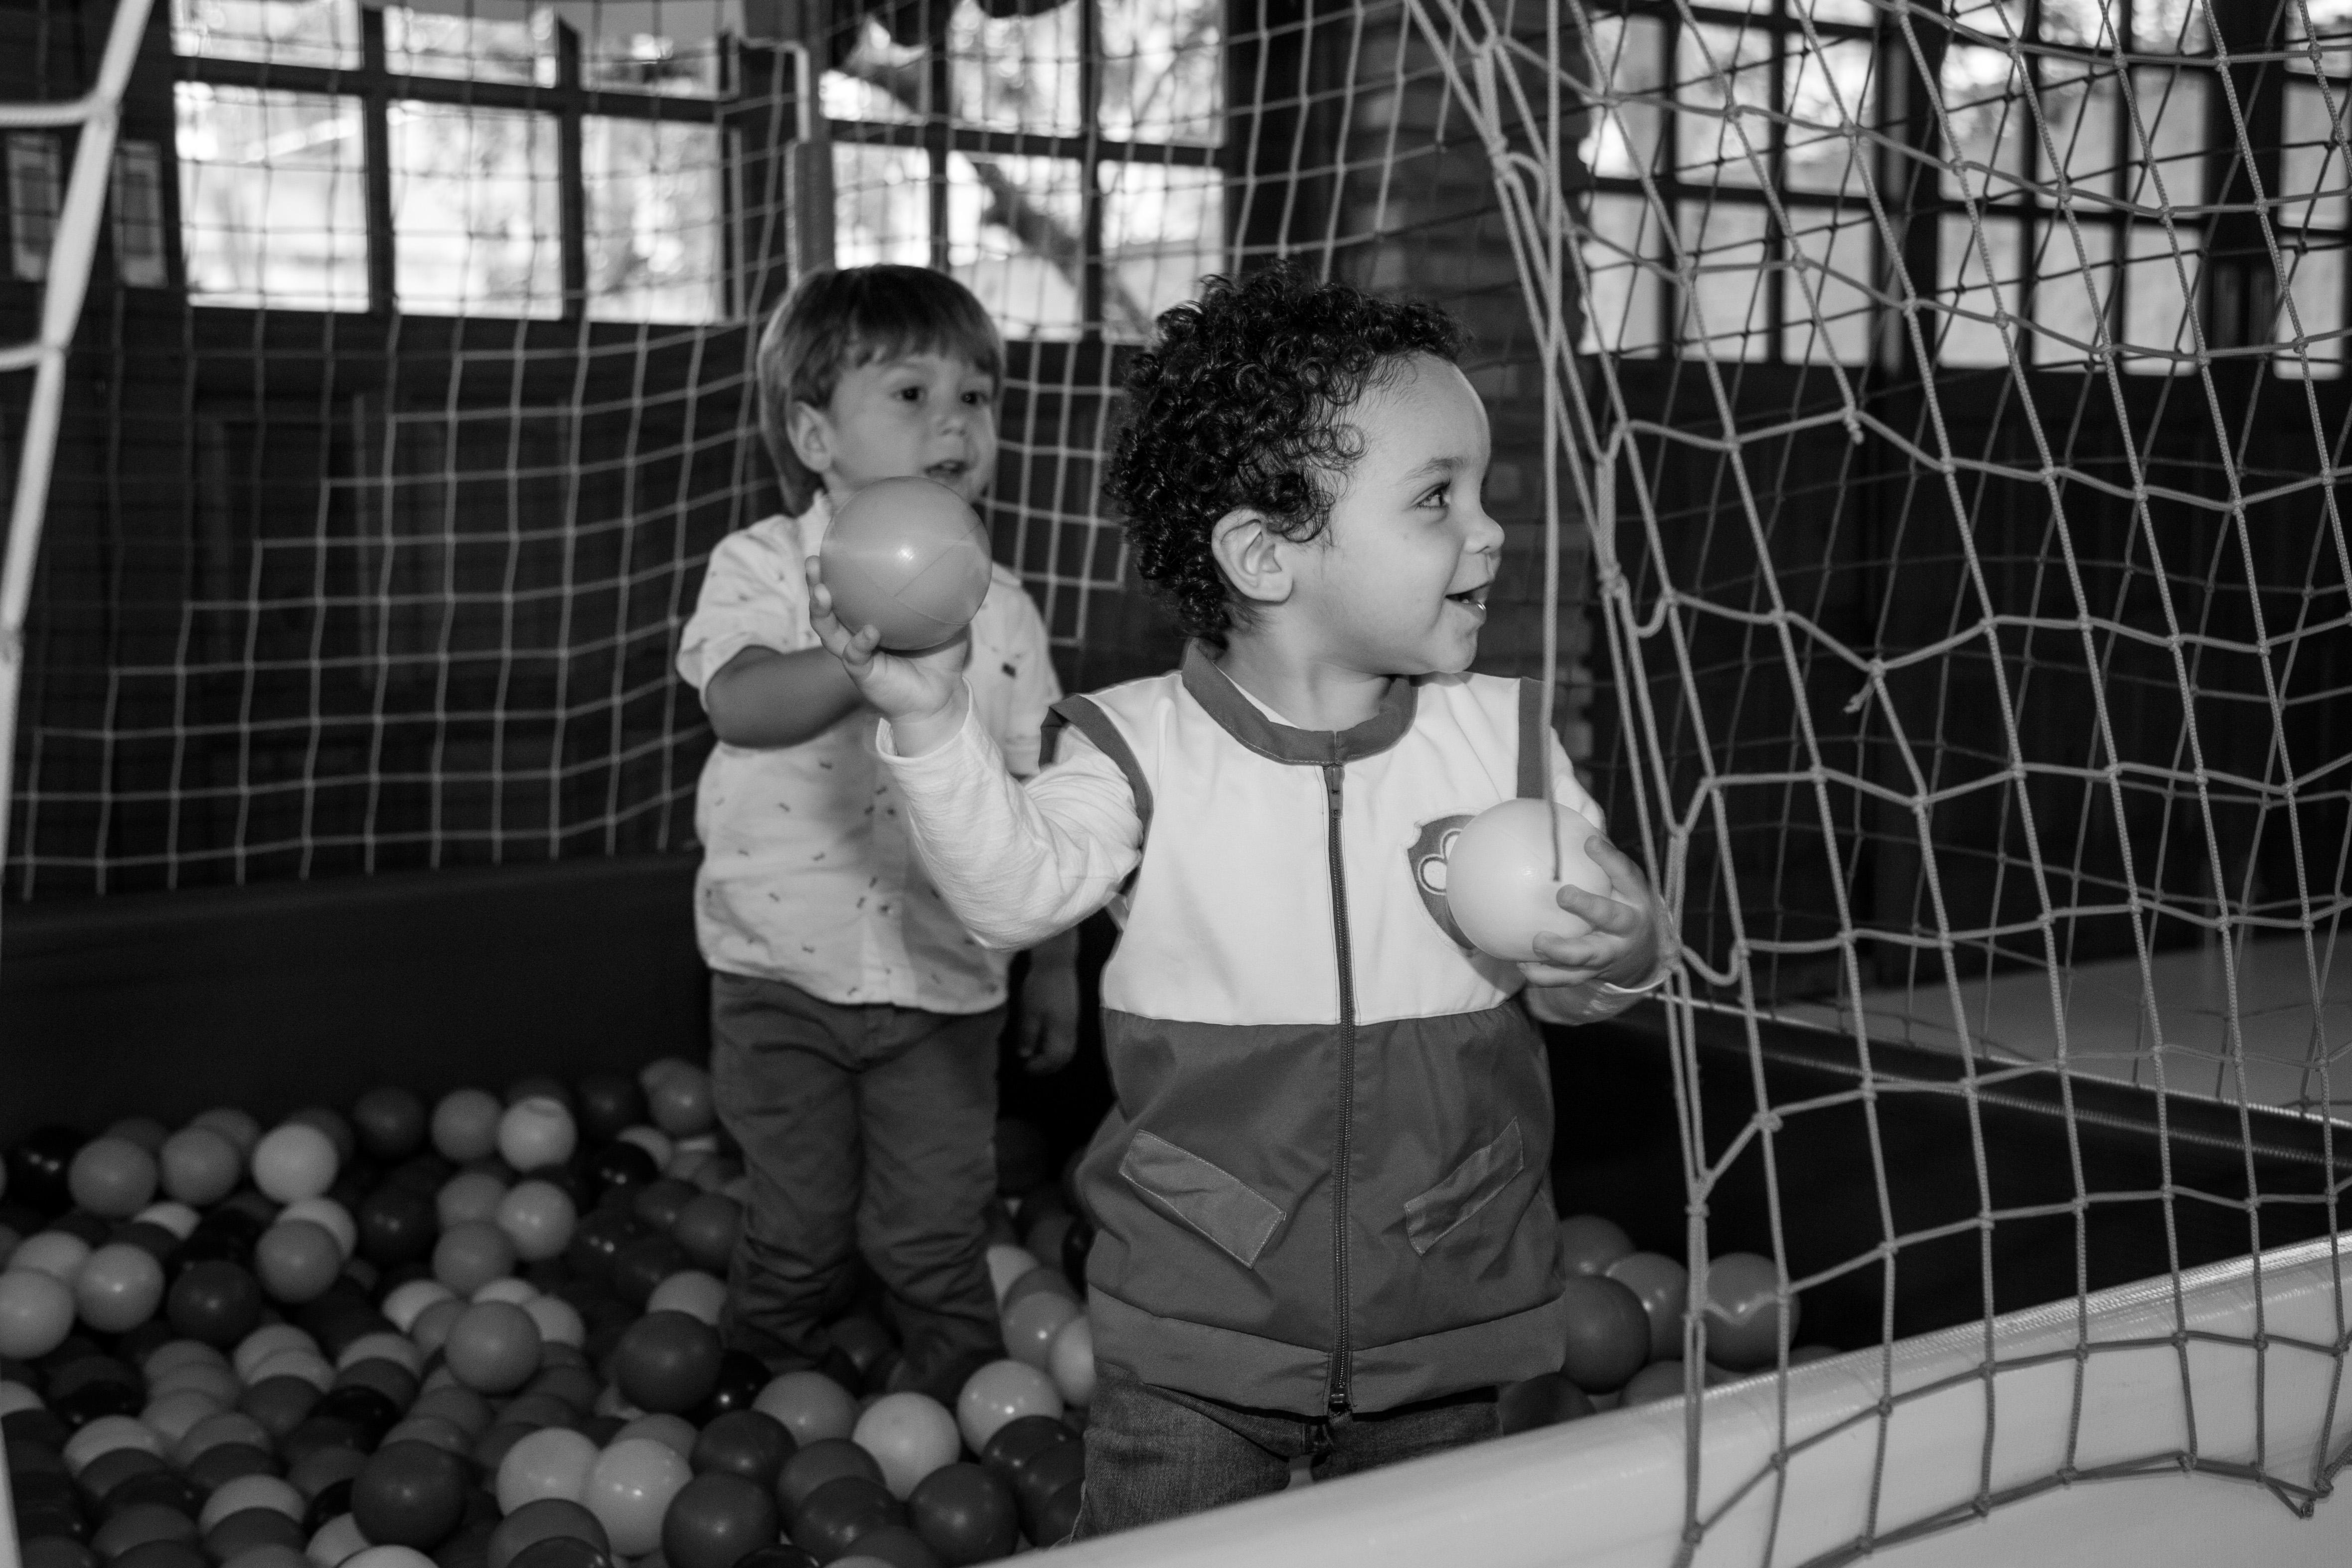 Festa‐Infantil‐Florianopolis‐Ana‐Marmo‐FotografiaFesta‐Infantil‐Florianopolis‐Ana‐Marmo‐Fotografia191A0442